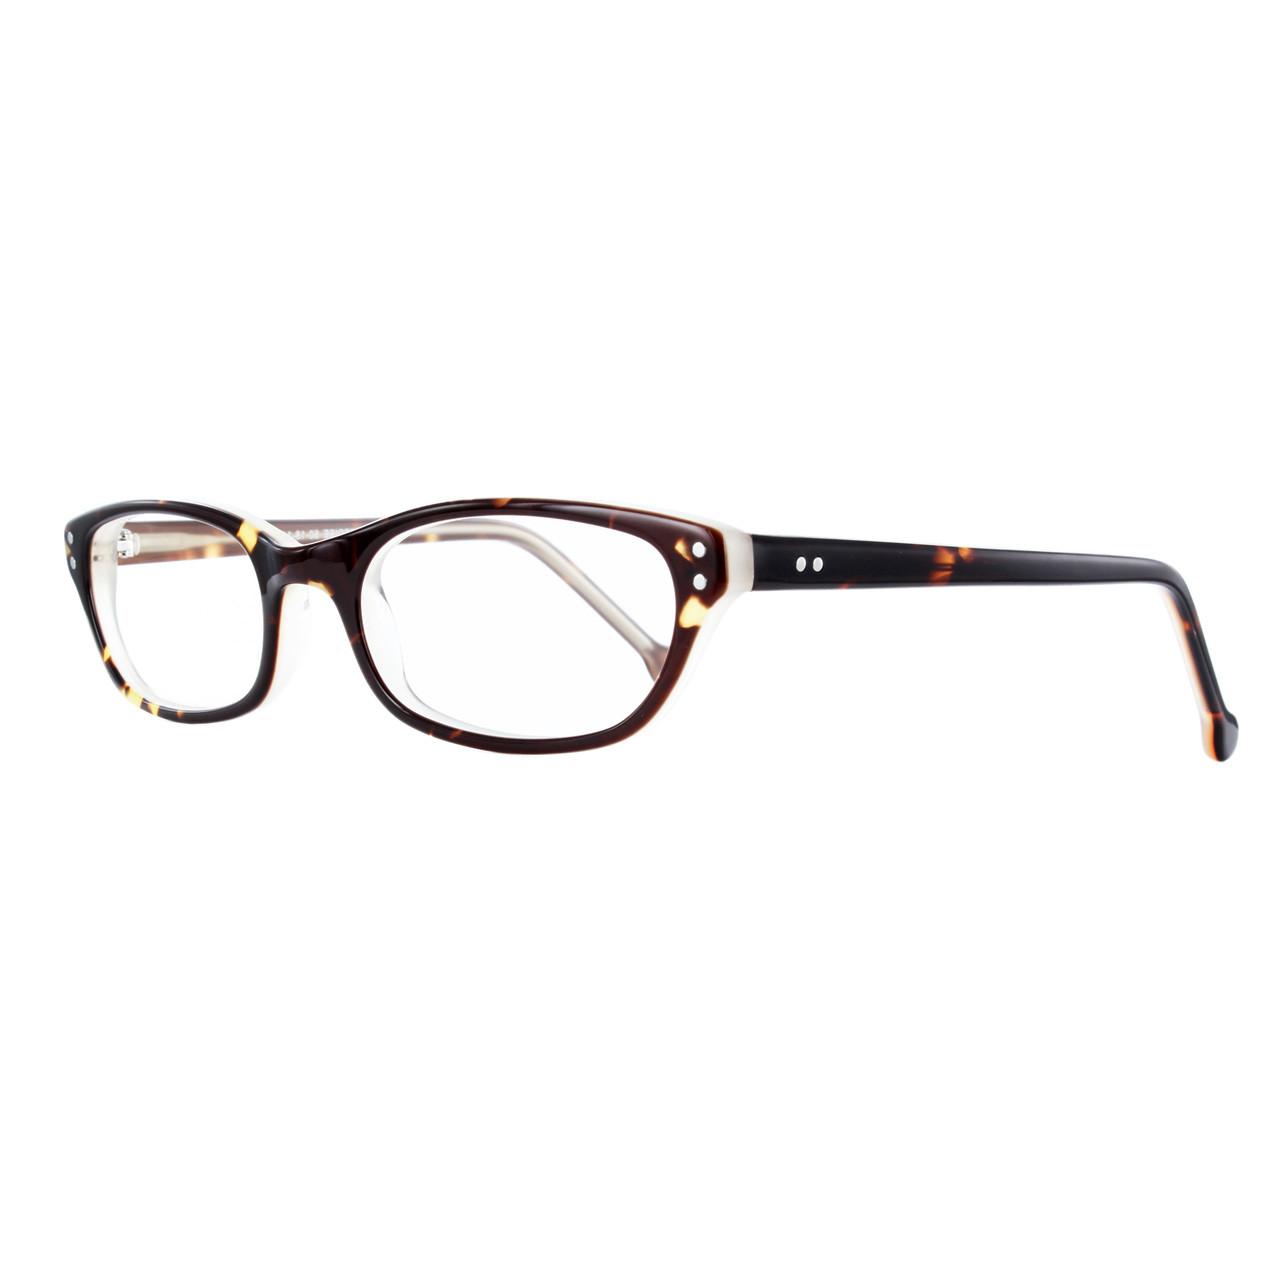 GEEK Eyewear GEEK 120 L